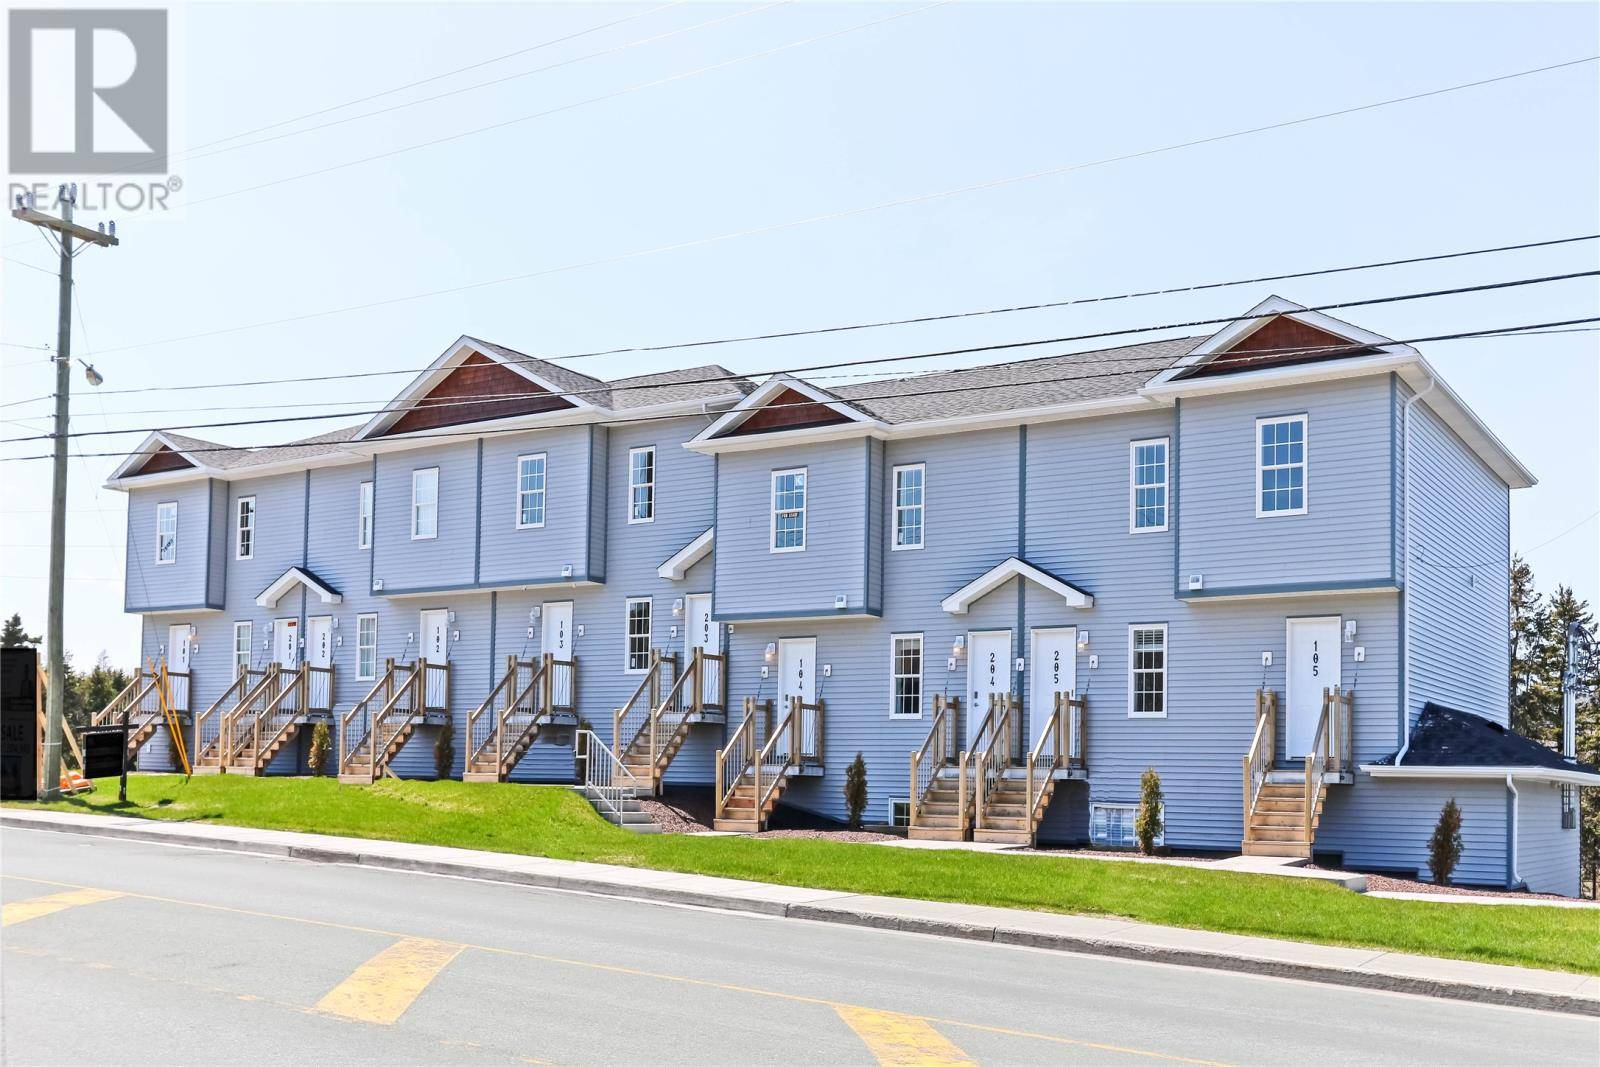 House for sale at 56 Bay Bulls Rd Unit 104 St. John's Newfoundland - MLS: 1200772